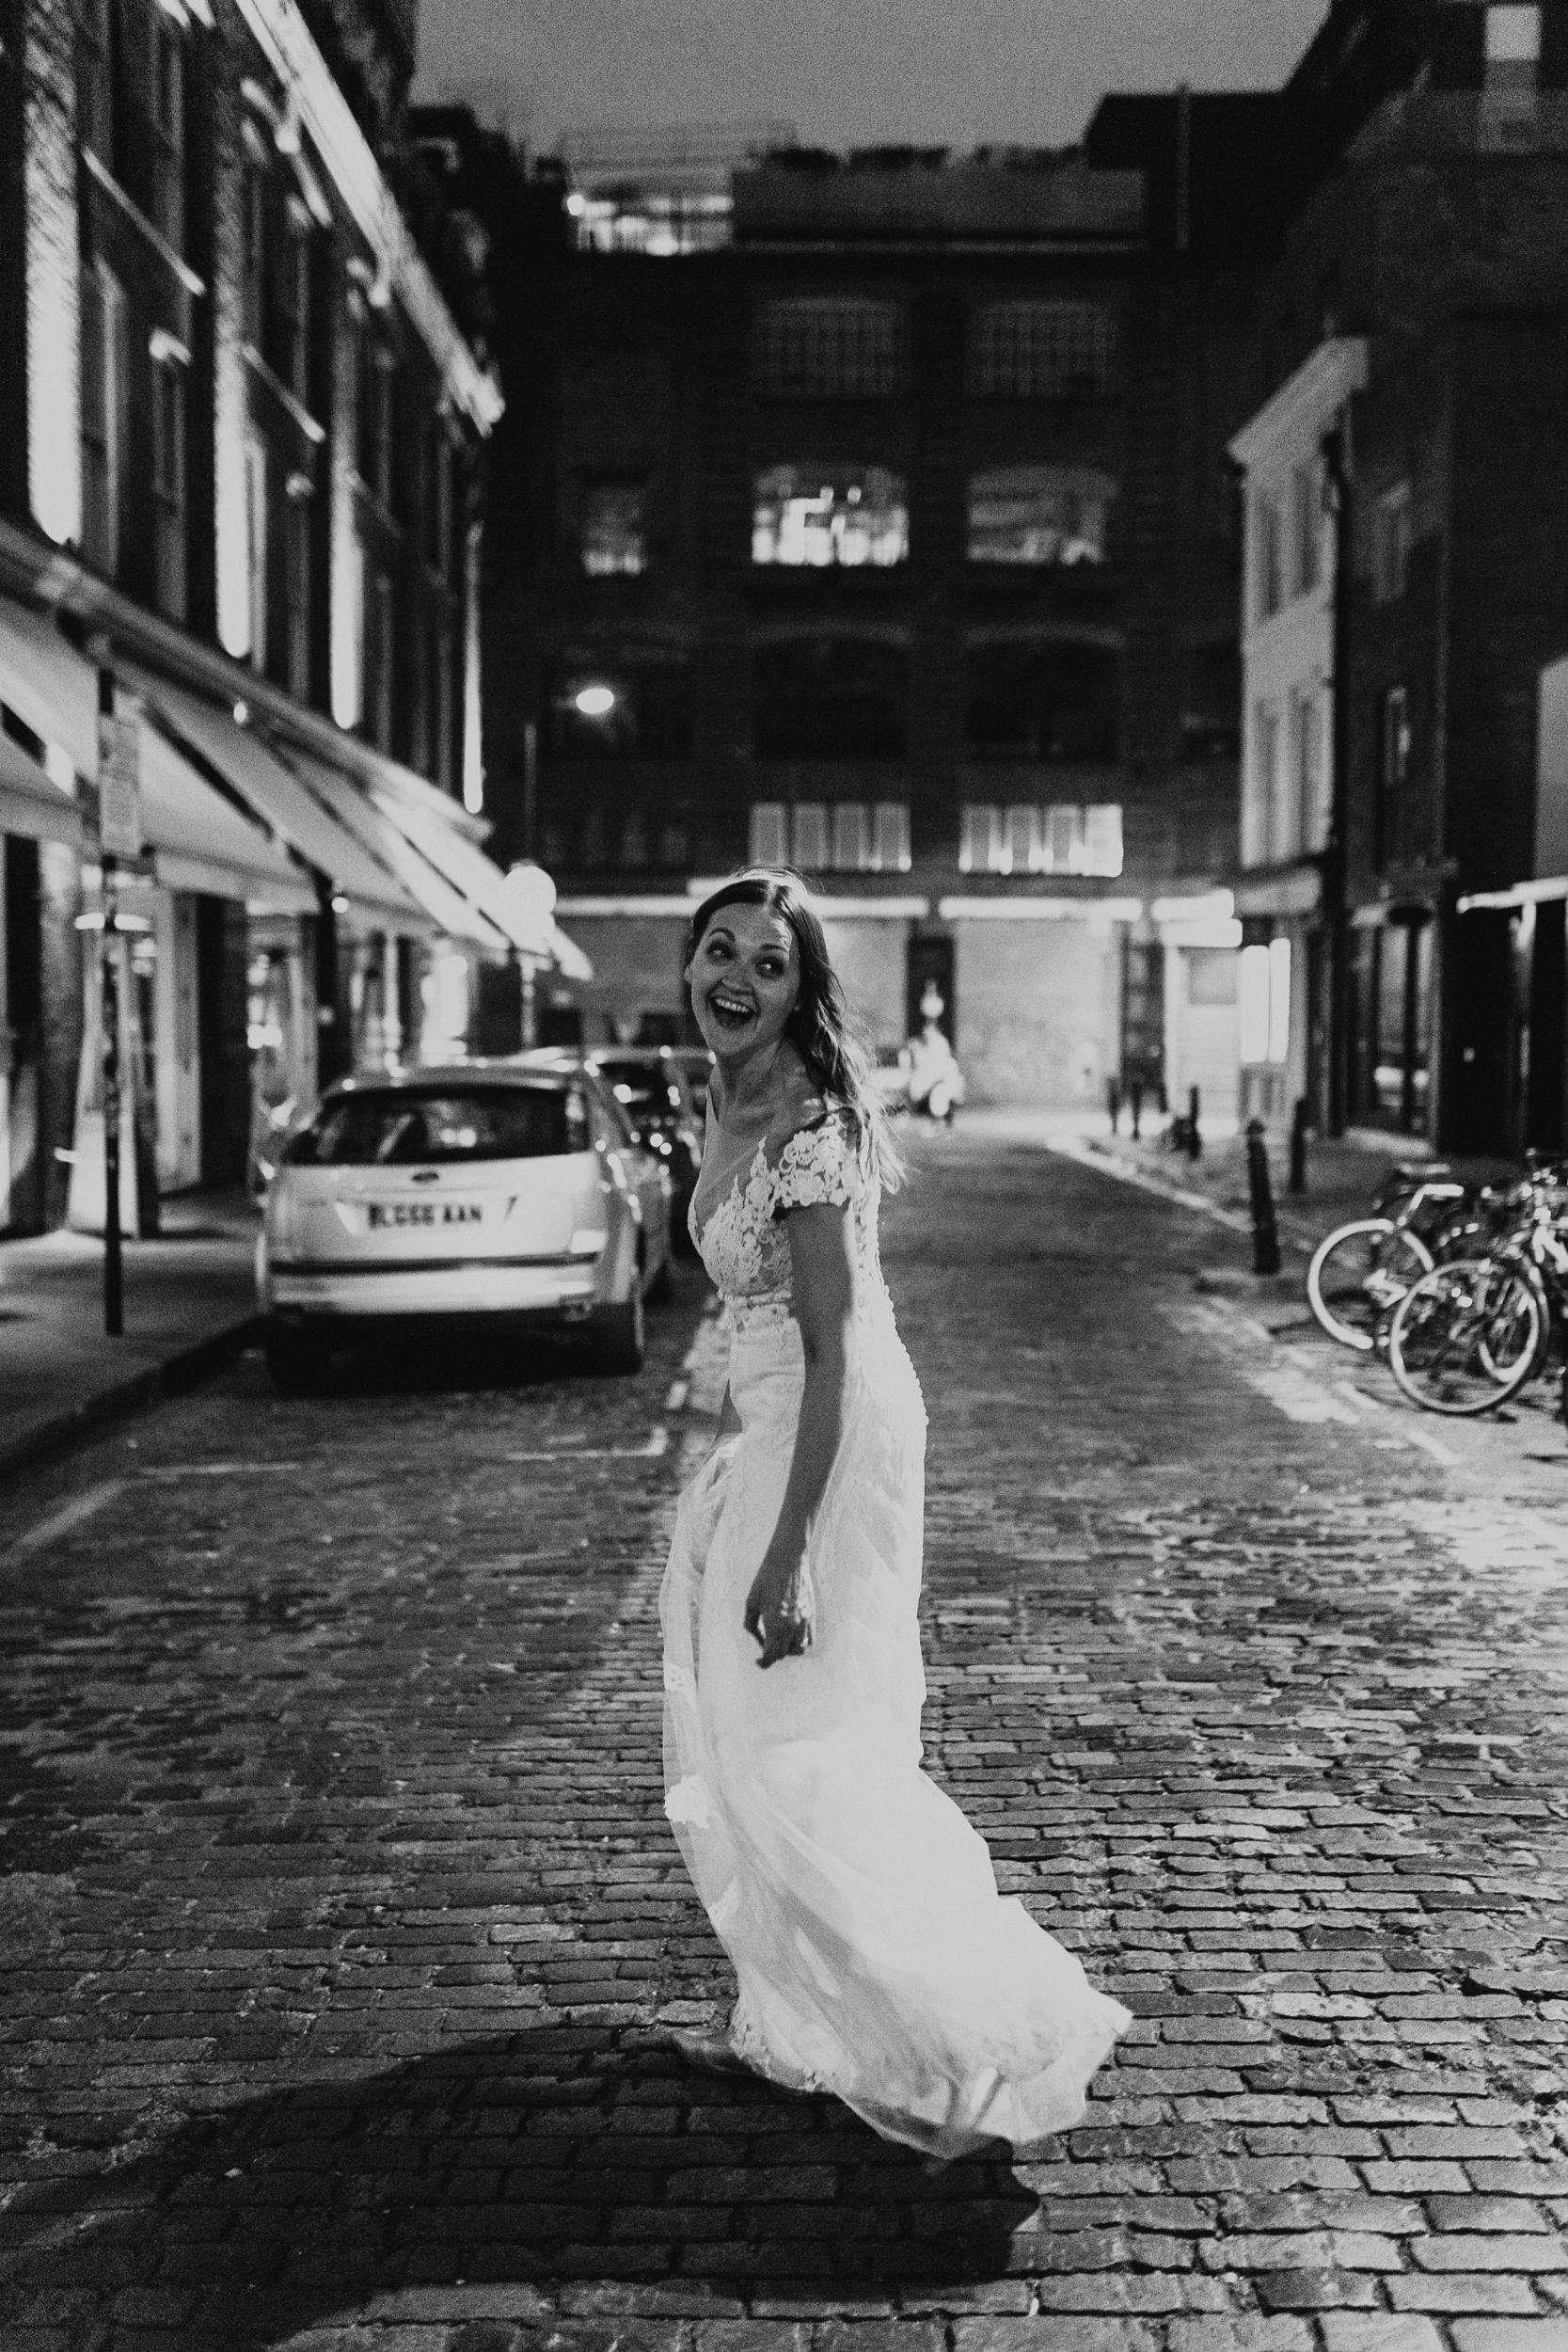 Laura-Benn-The-Asylum-London-The-Ace-Hotel-Wedding-Alternative-Darina-Stoda-Photography-803.jpg